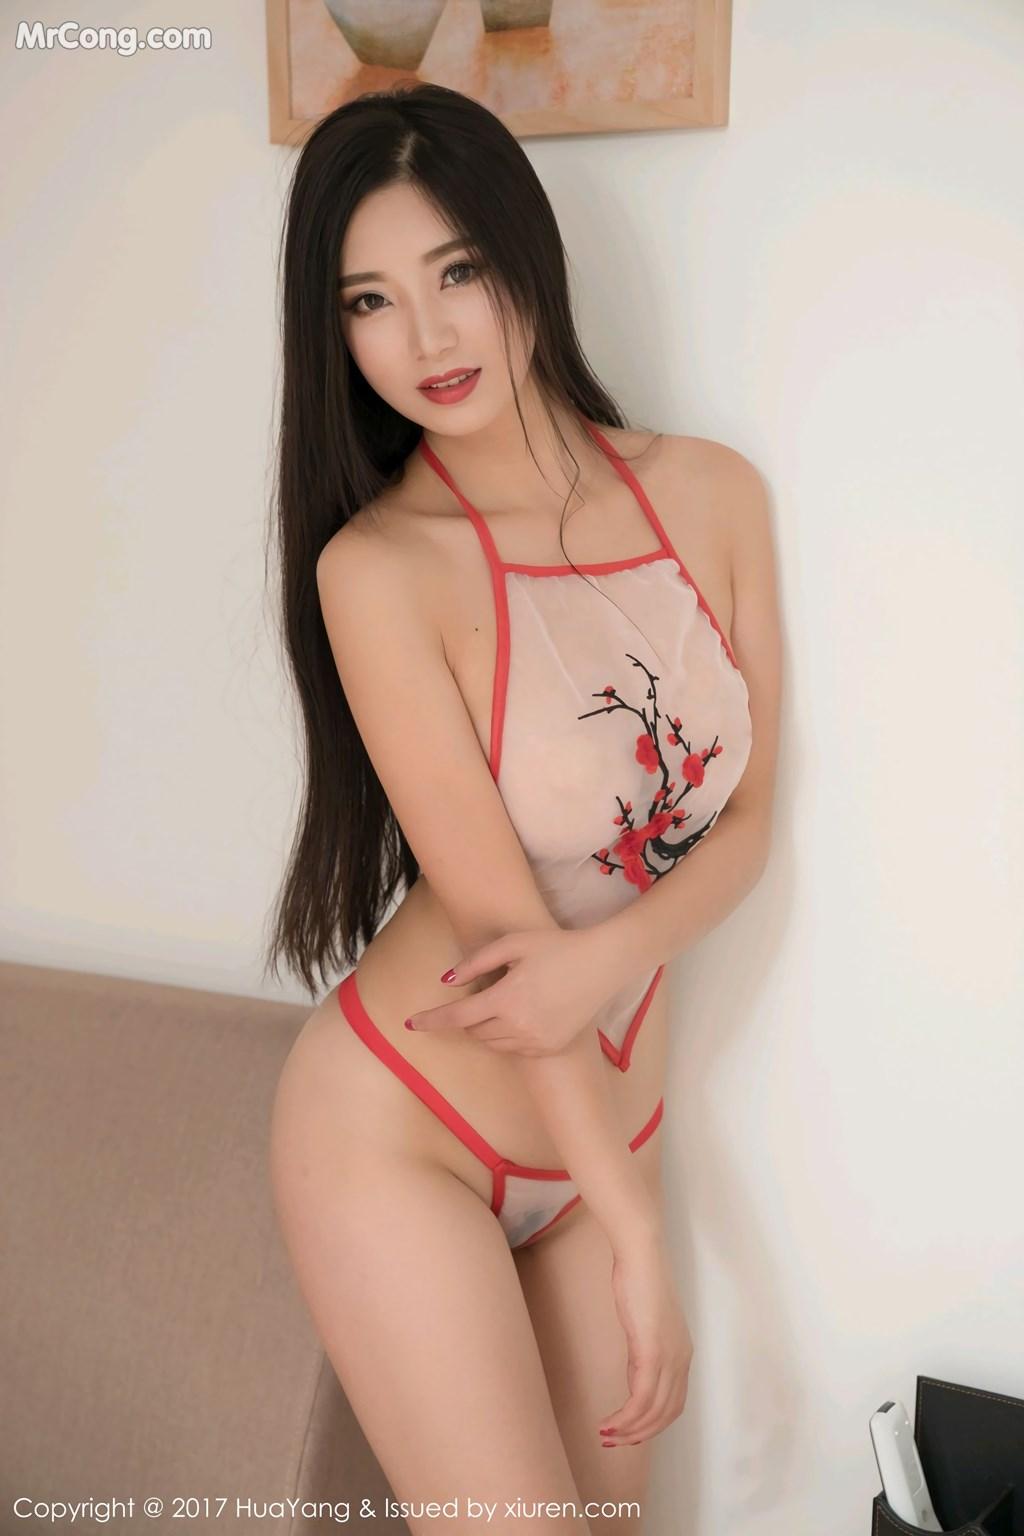 Image HuaYang-2017-11-10-Vol.015-KiKi-MrCong.com-015 in post HuaYang 2017-11-10 Vol.015: Người mẫu 宋-KiKi (45 ảnh)